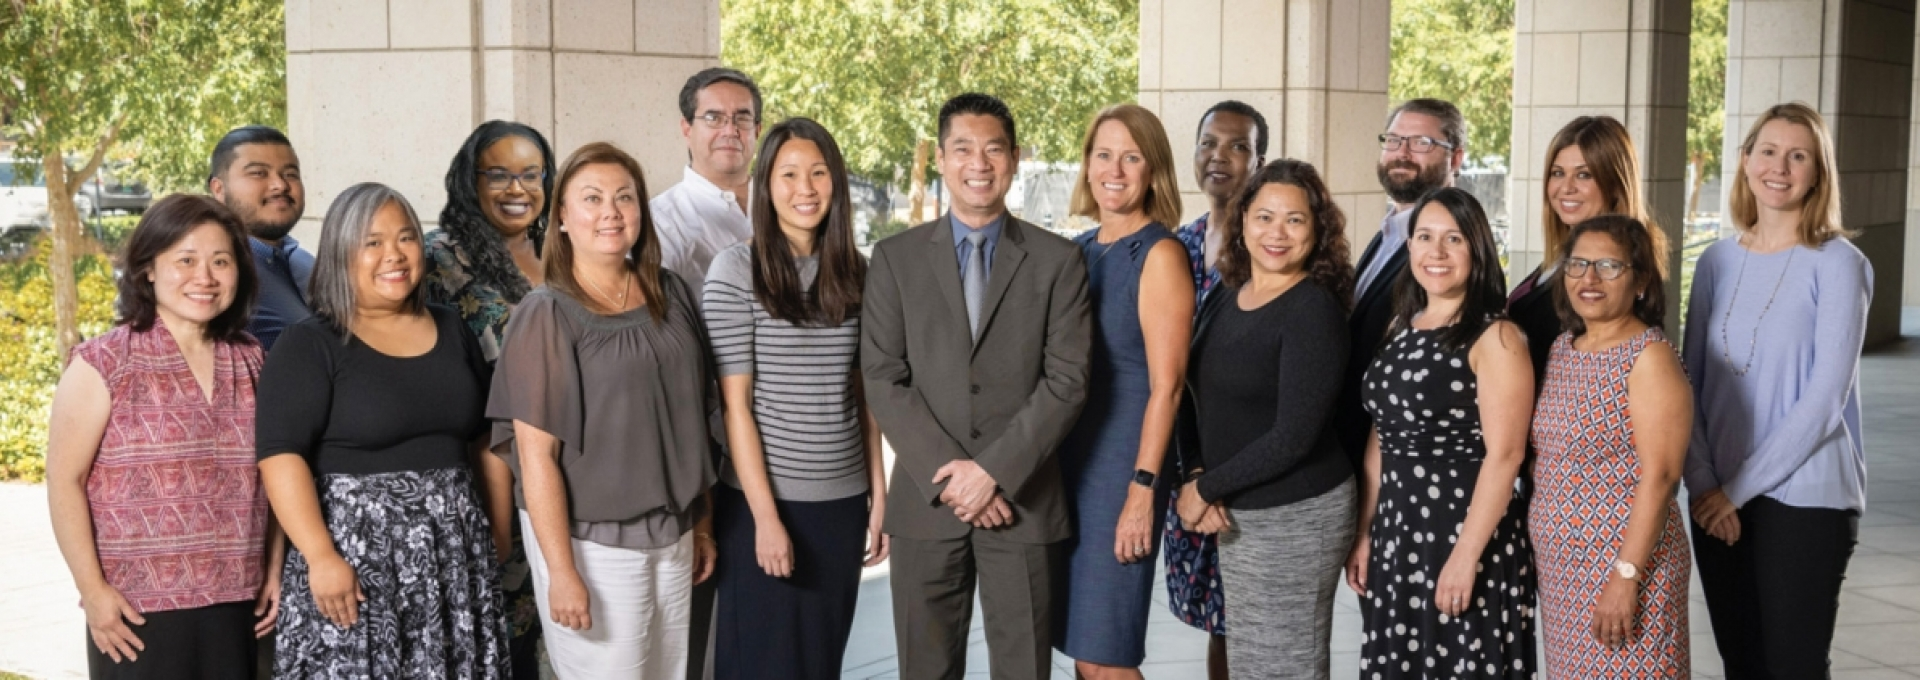 Stanford Conferences Team